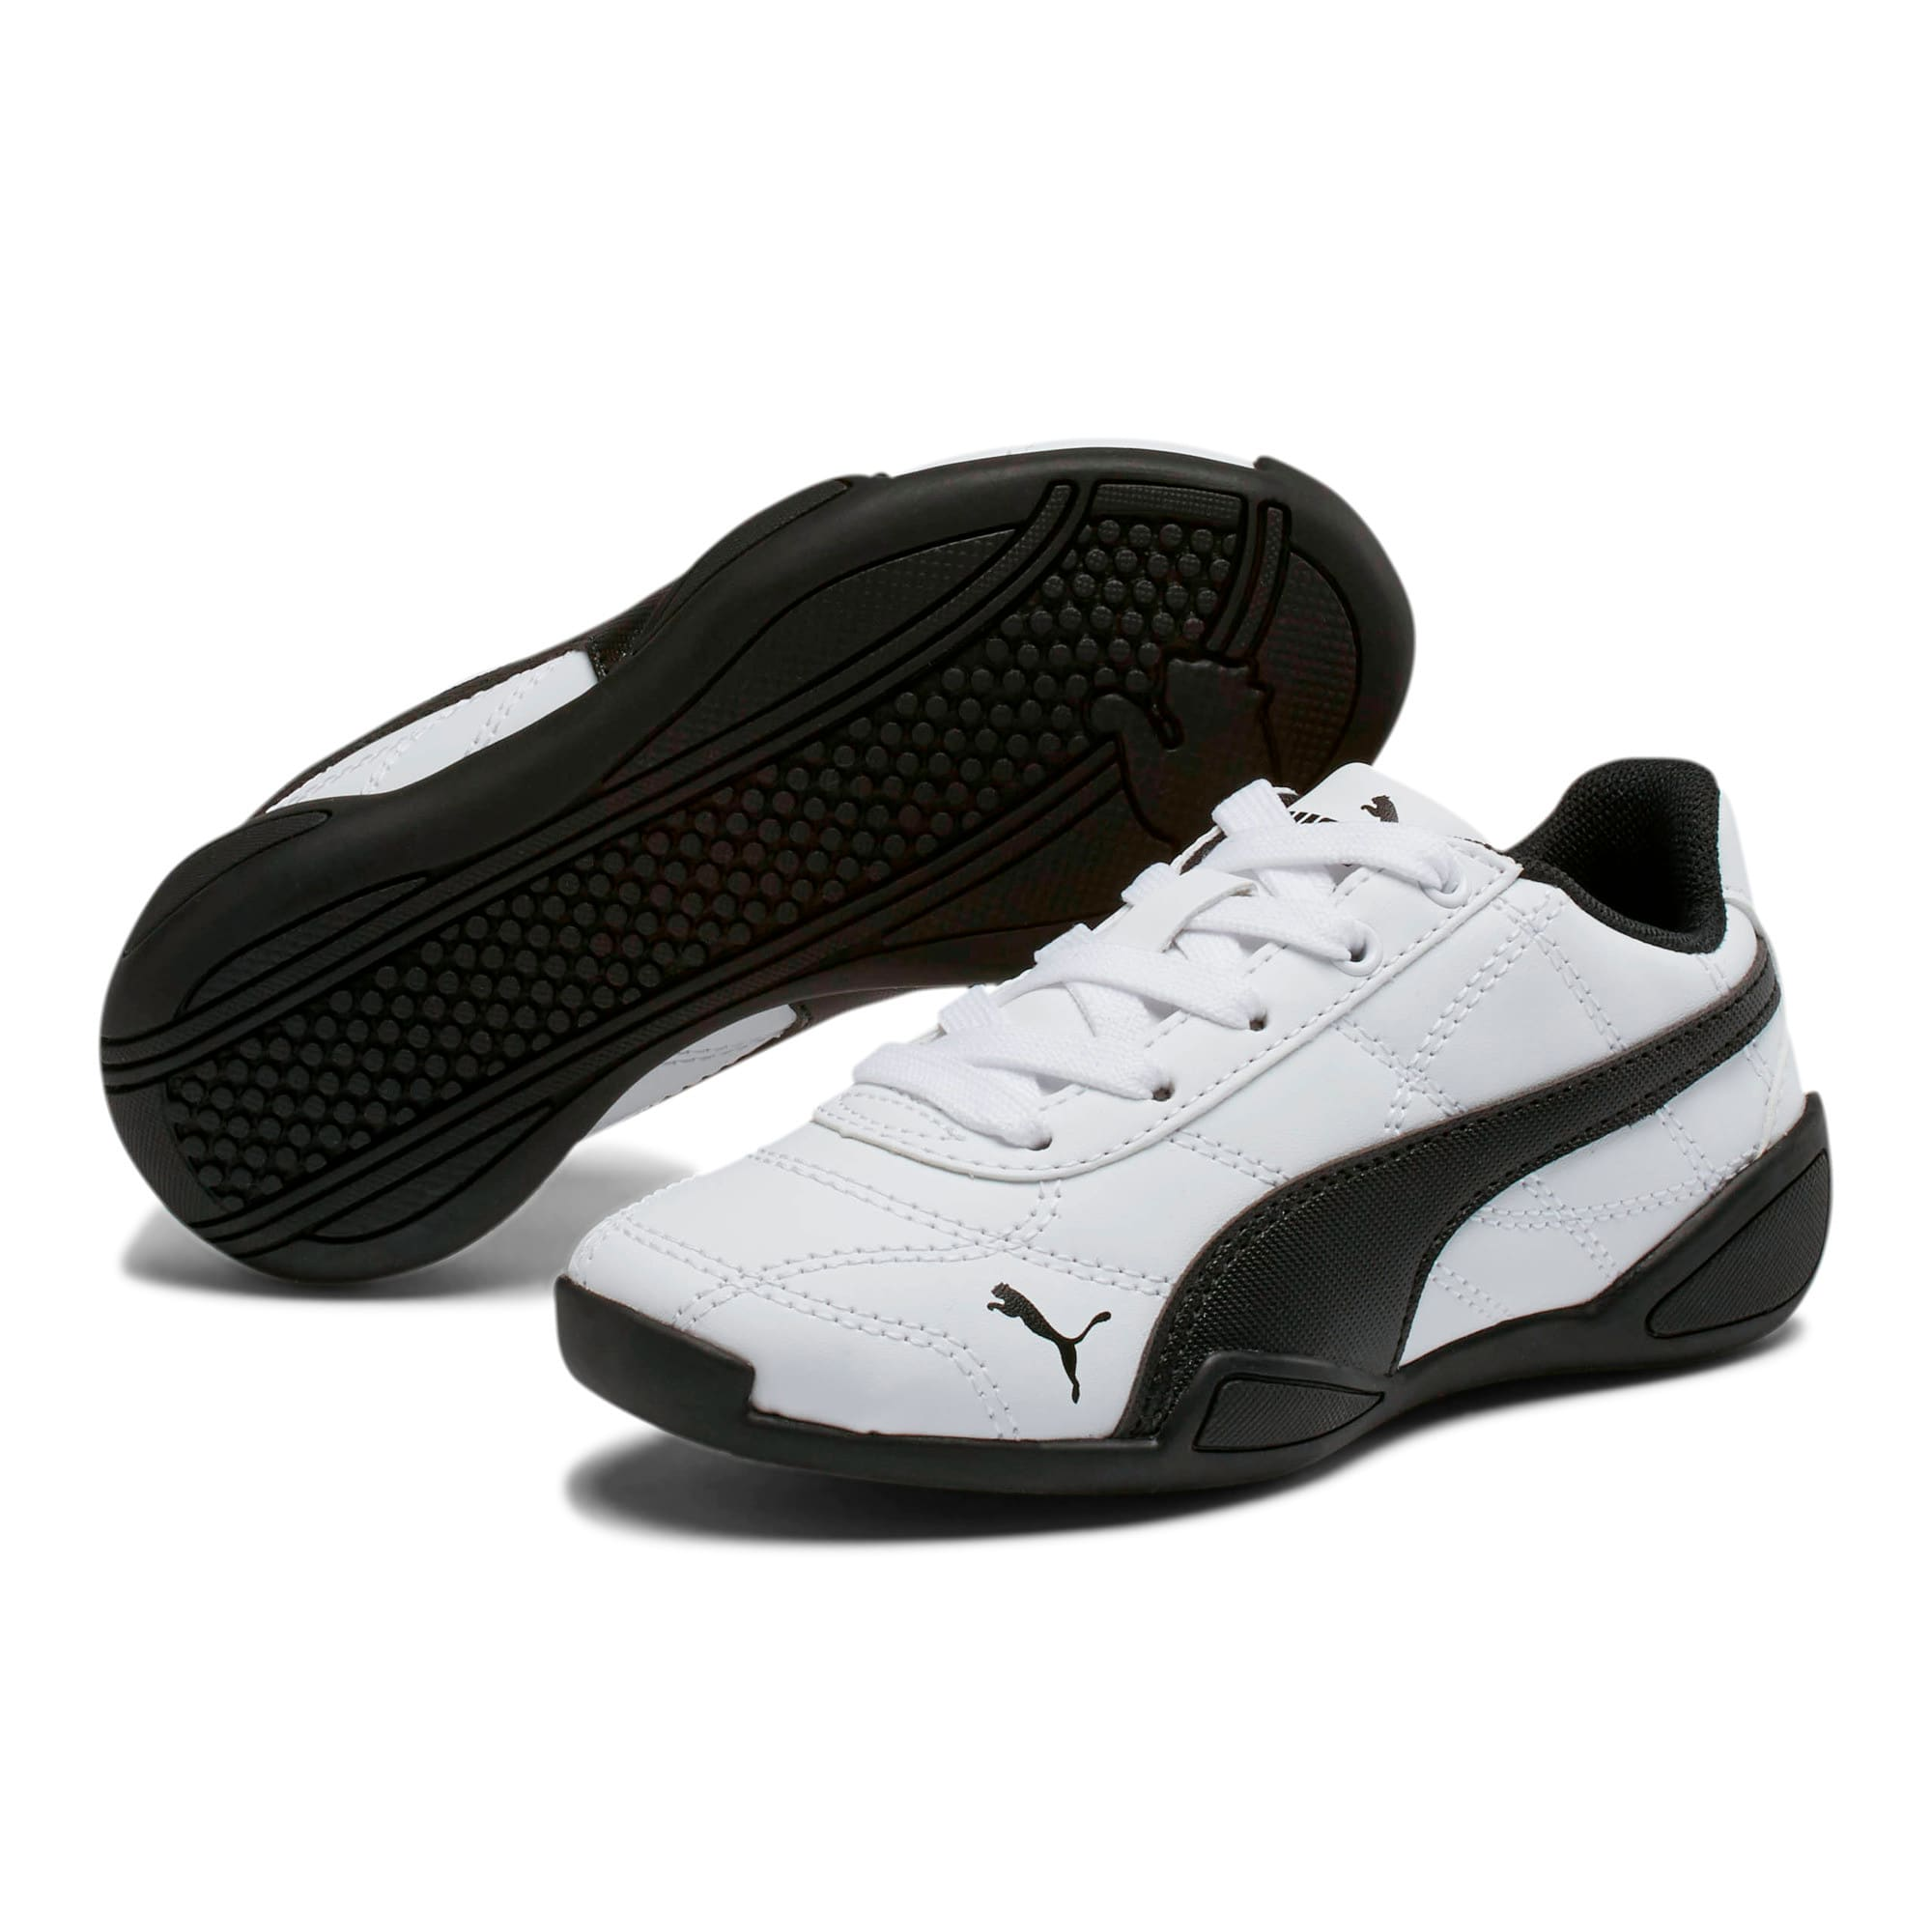 Thumbnail 2 of Tune Cat 3 Little Kids' Shoes, Puma White-Puma Black, medium